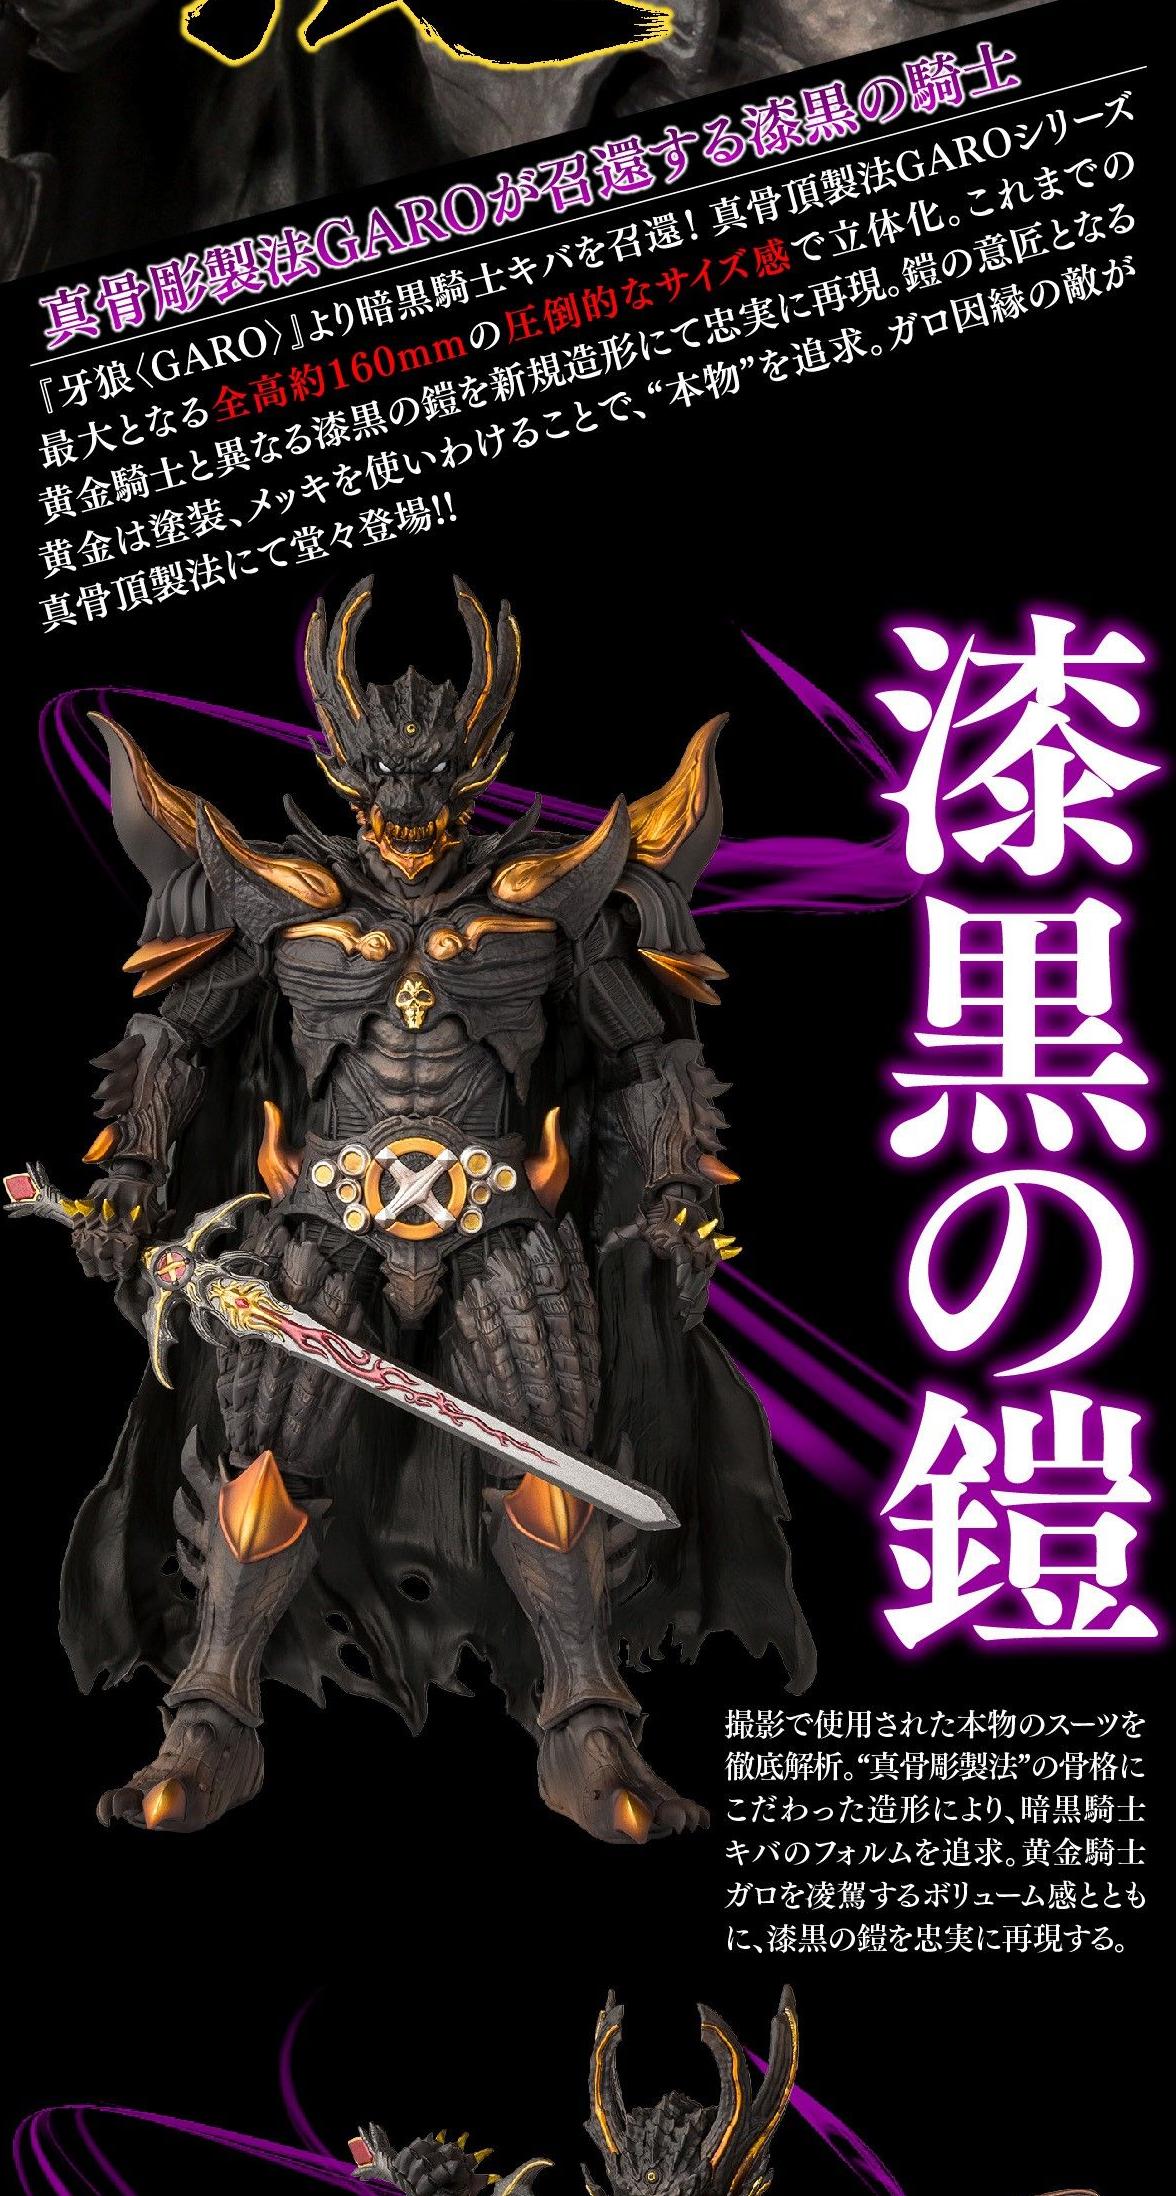 Figuarts(真骨彫製法) 暗黒騎士キバ予約2